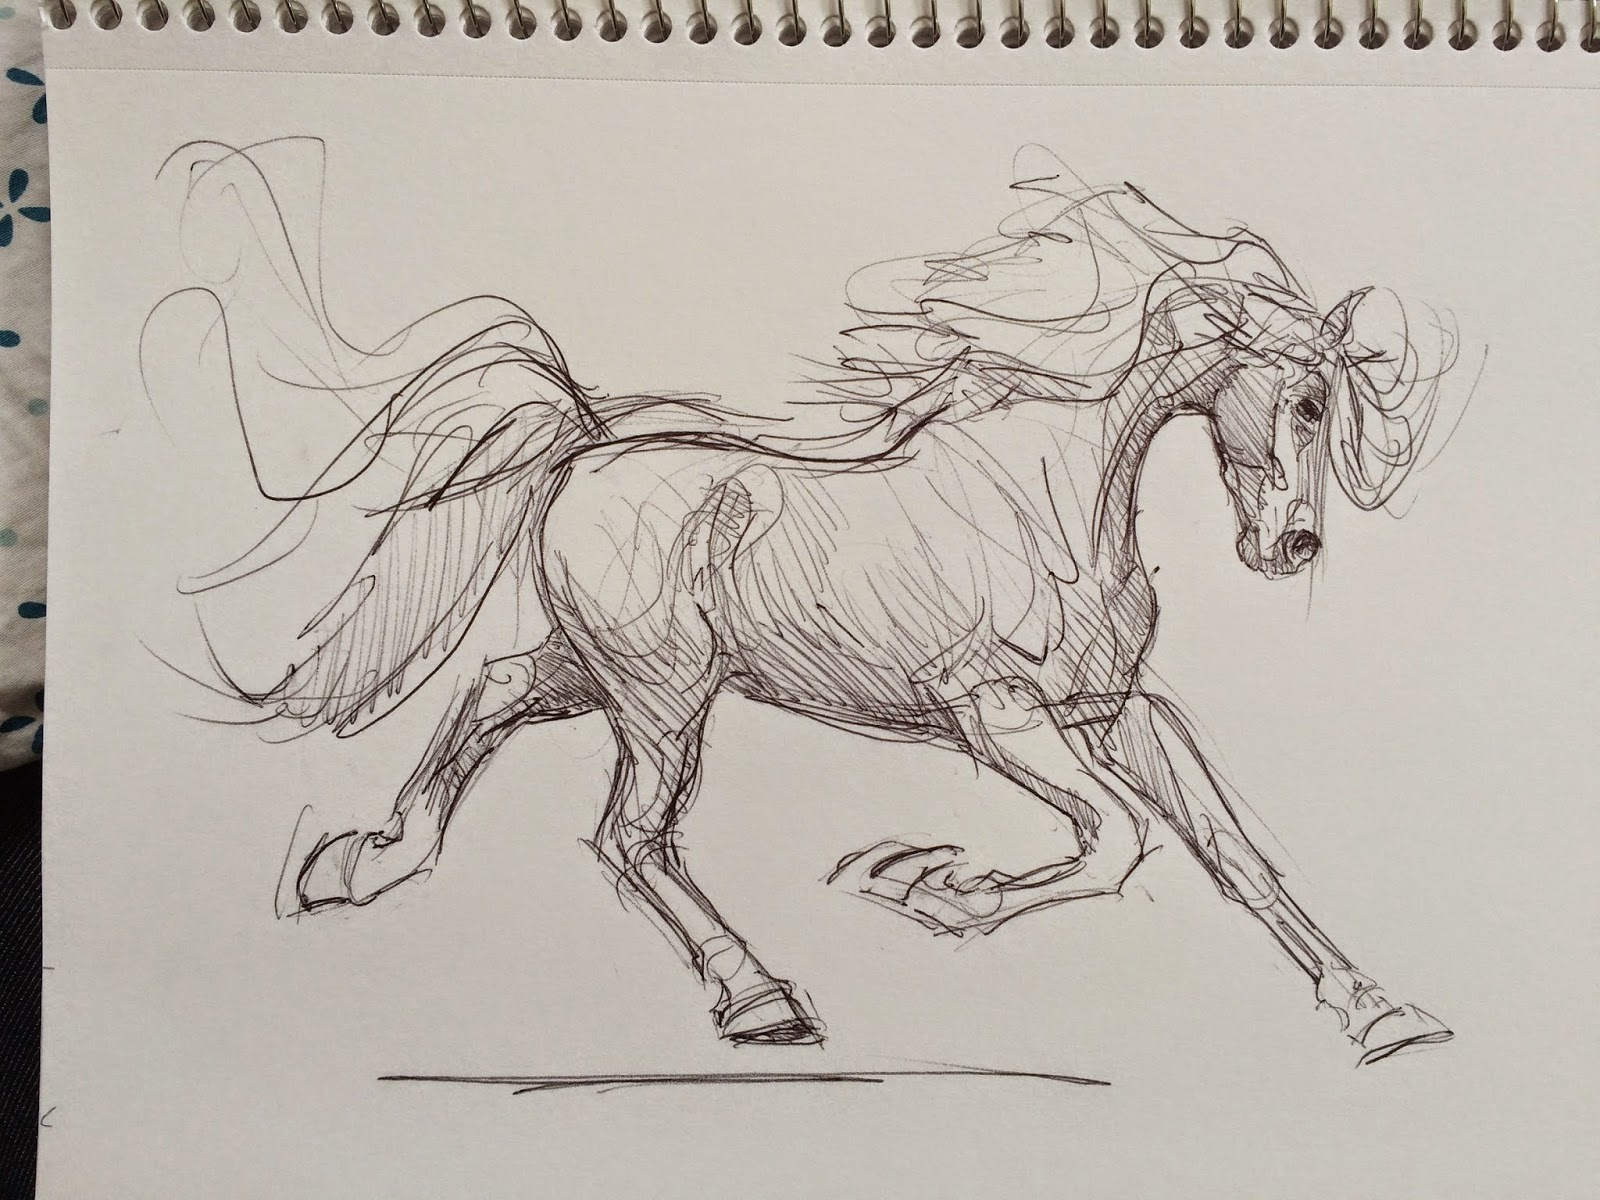 Cool   Wallpaper Horse Watercolor - TwoC%2BWC%2BhorsesProcess02  HD_85837.jpg